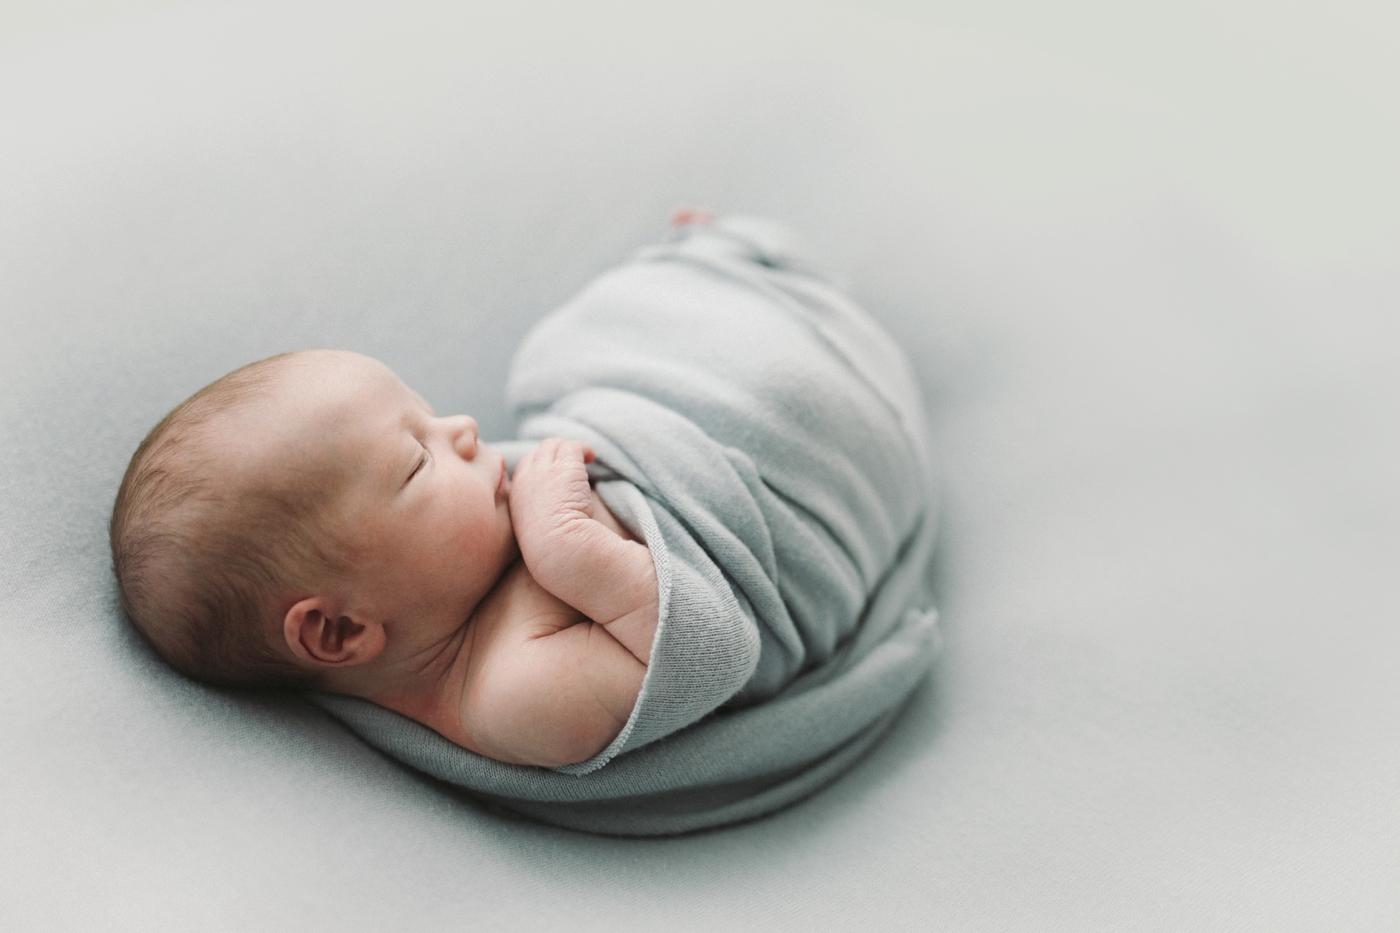 Baby William - Natural Newborn Photography in Adelaide - Simple and Beautiful Newborn Photography - Katherine Schultz - Natural Light Newborn Photographer in Adelaide - www.katherineschultzphotography.com_0024.jpg